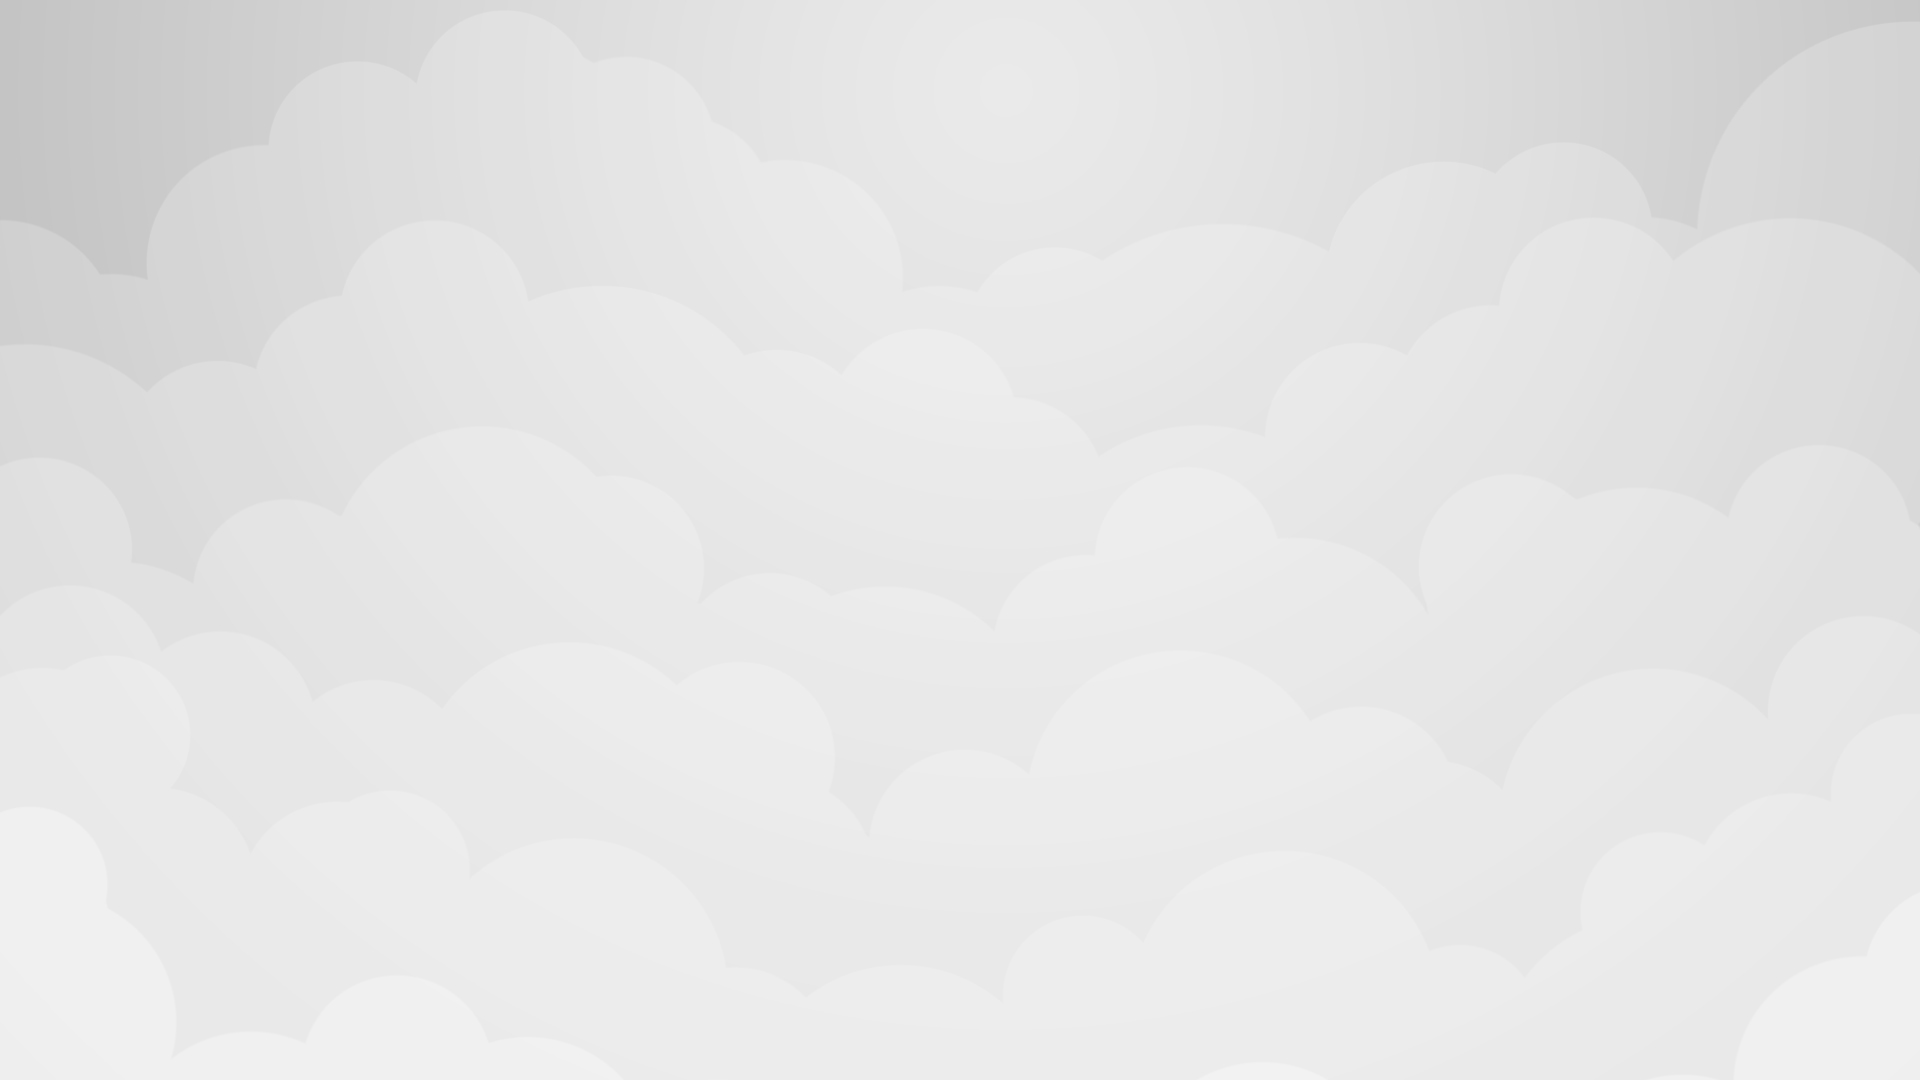 Inspirational Quotes Wallpaper Download All White Background For Desktop Pixelstalk Net